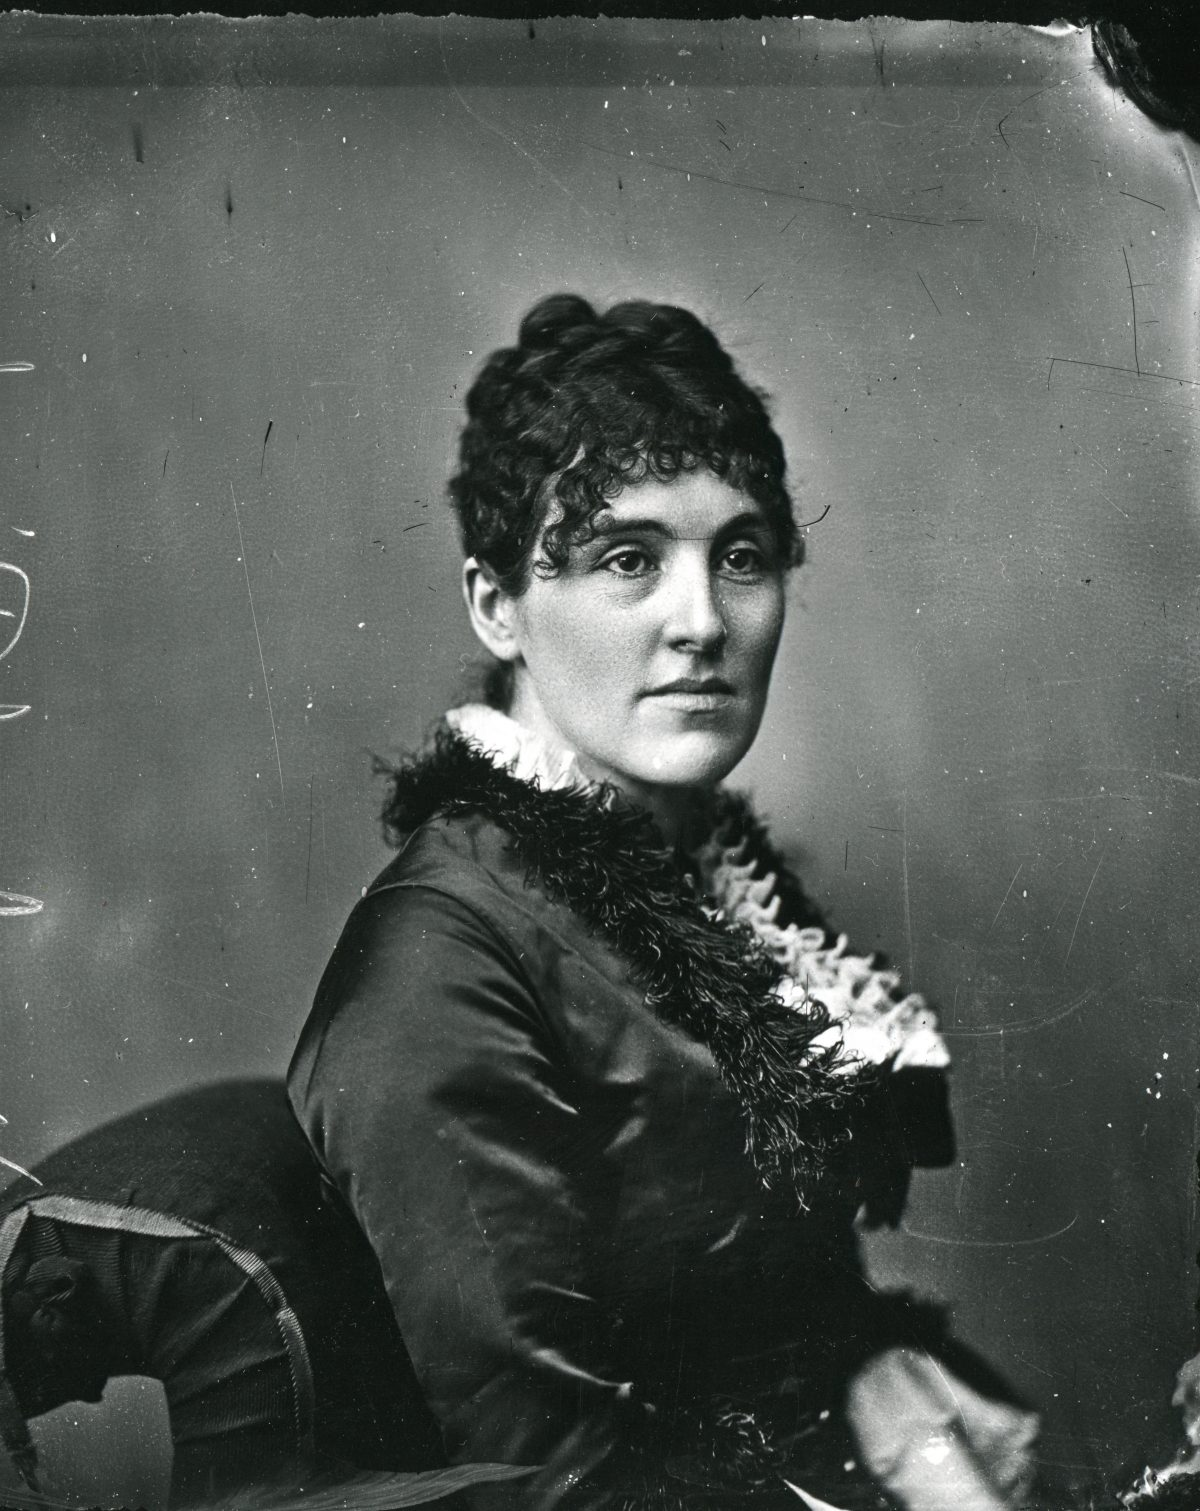 LaSalle Corbell Pickett